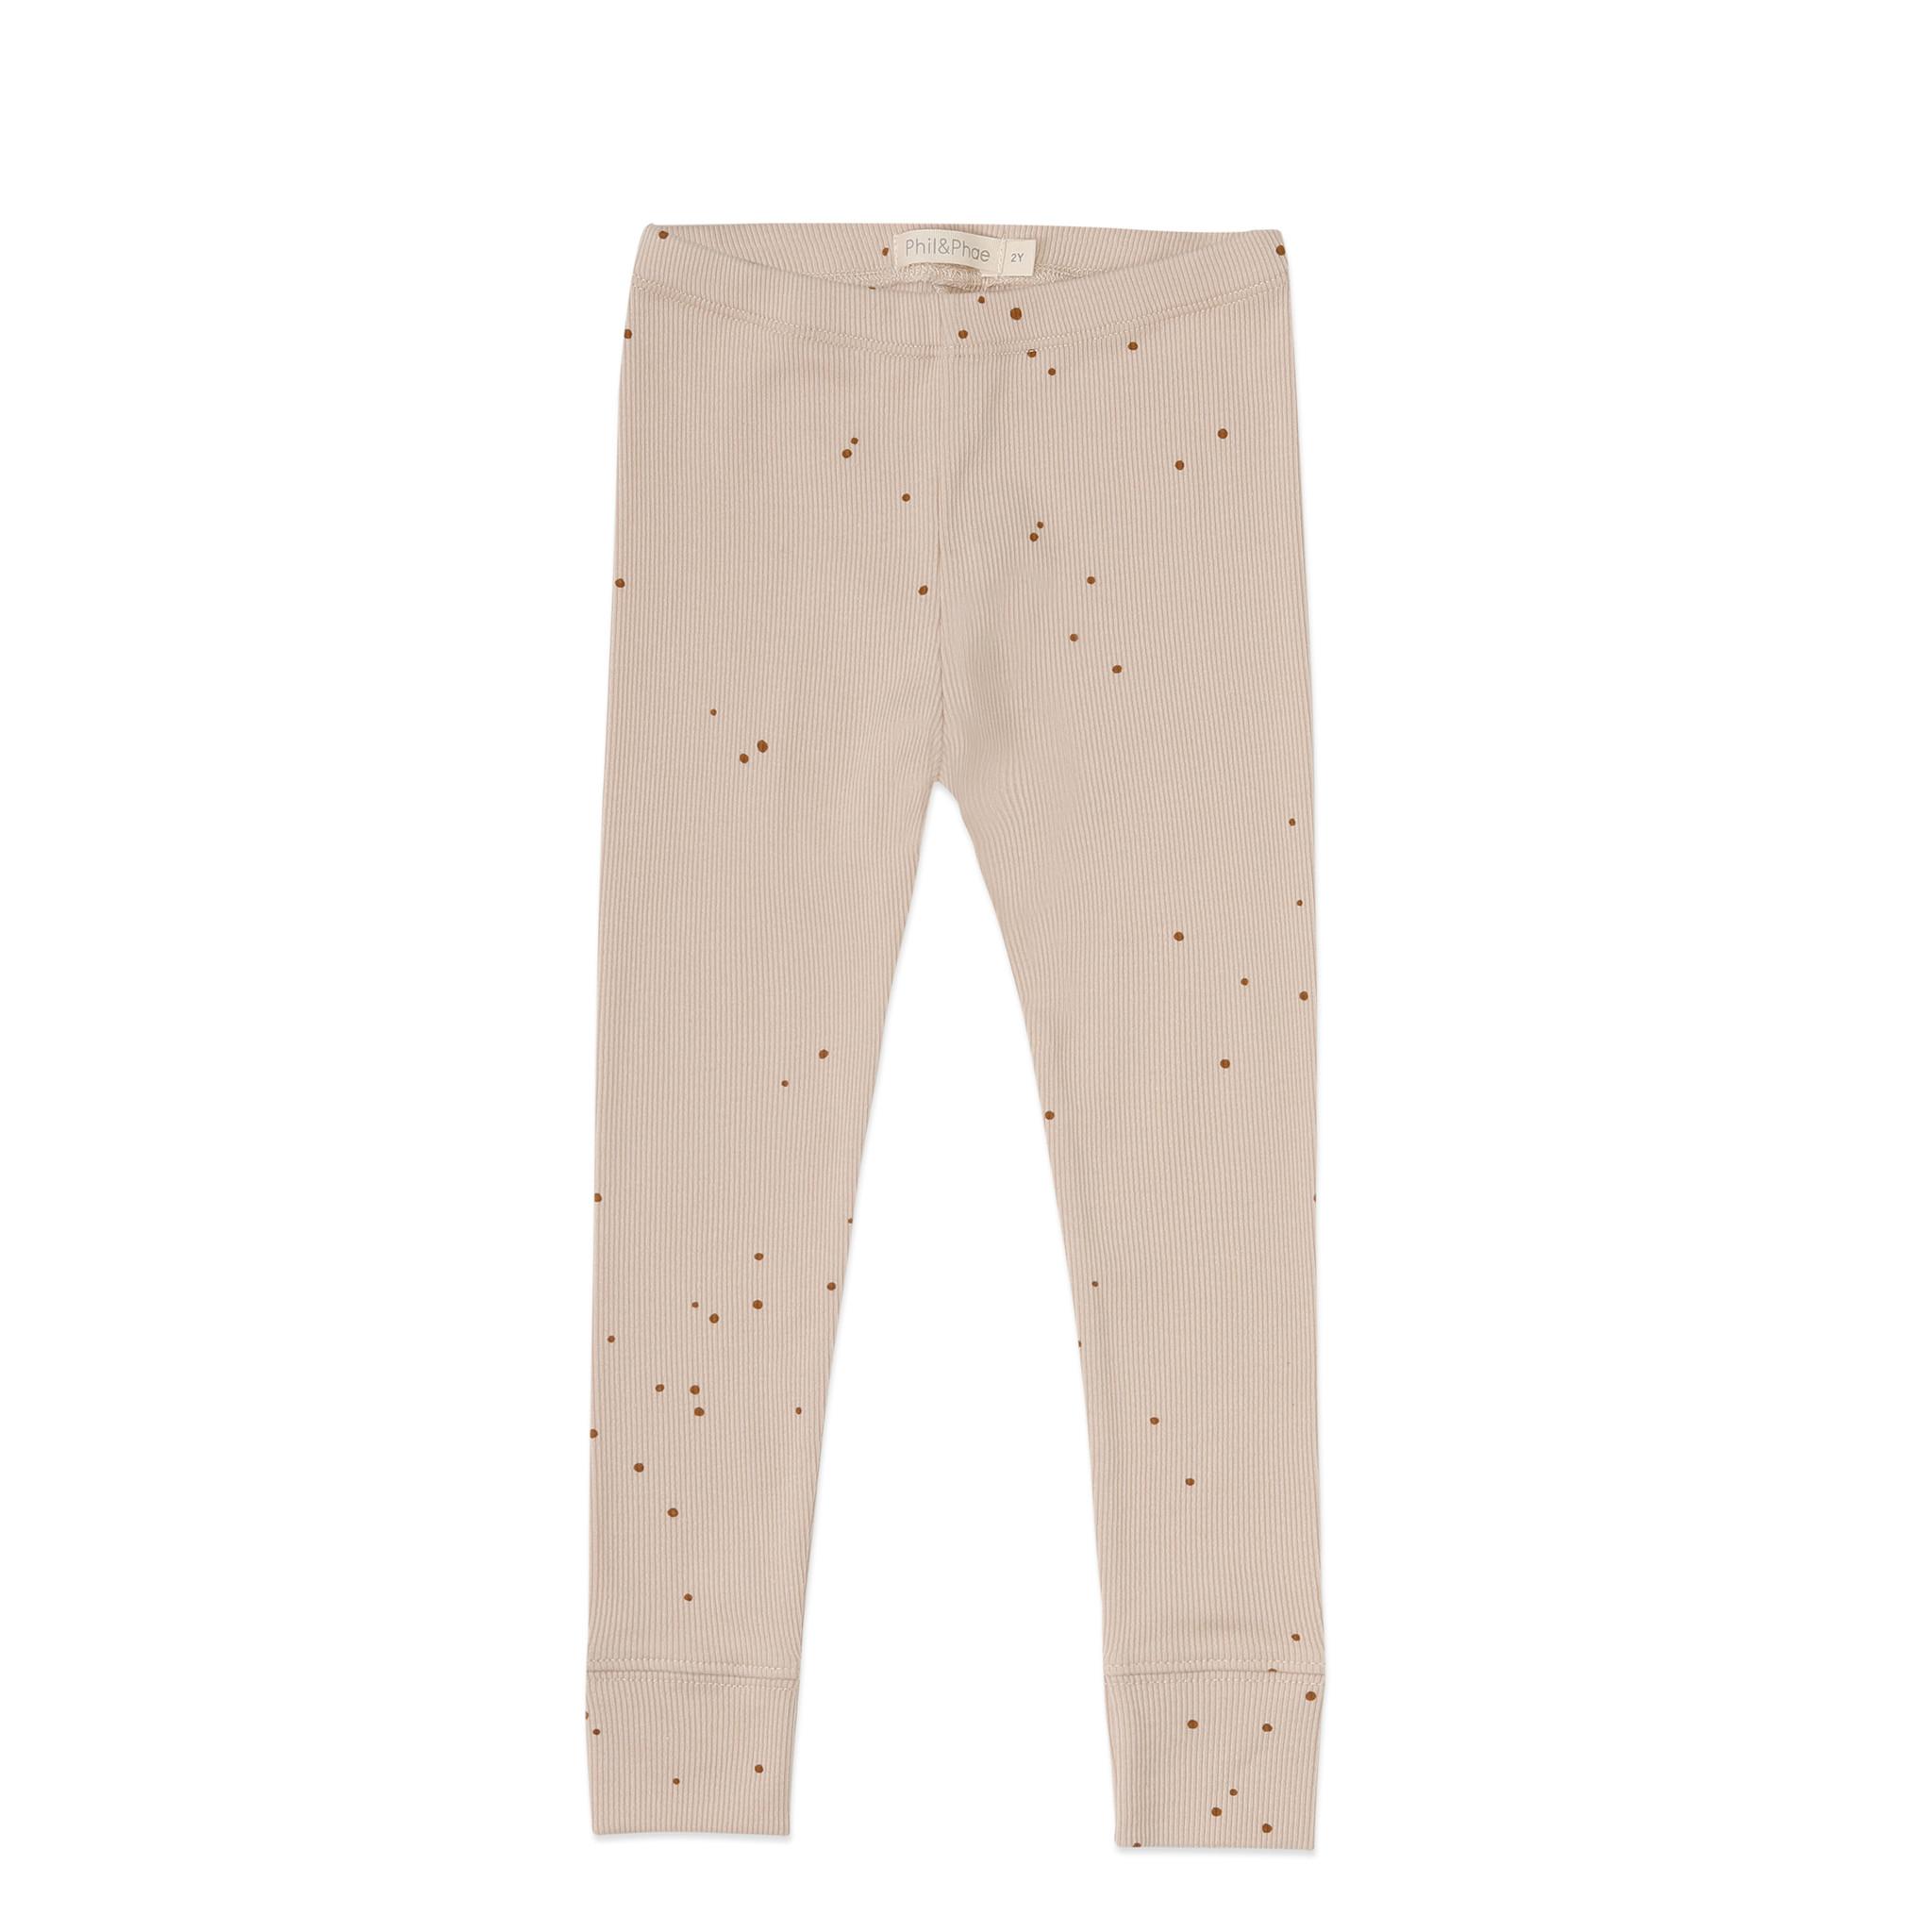 Rib leggings dots - warm cream-1